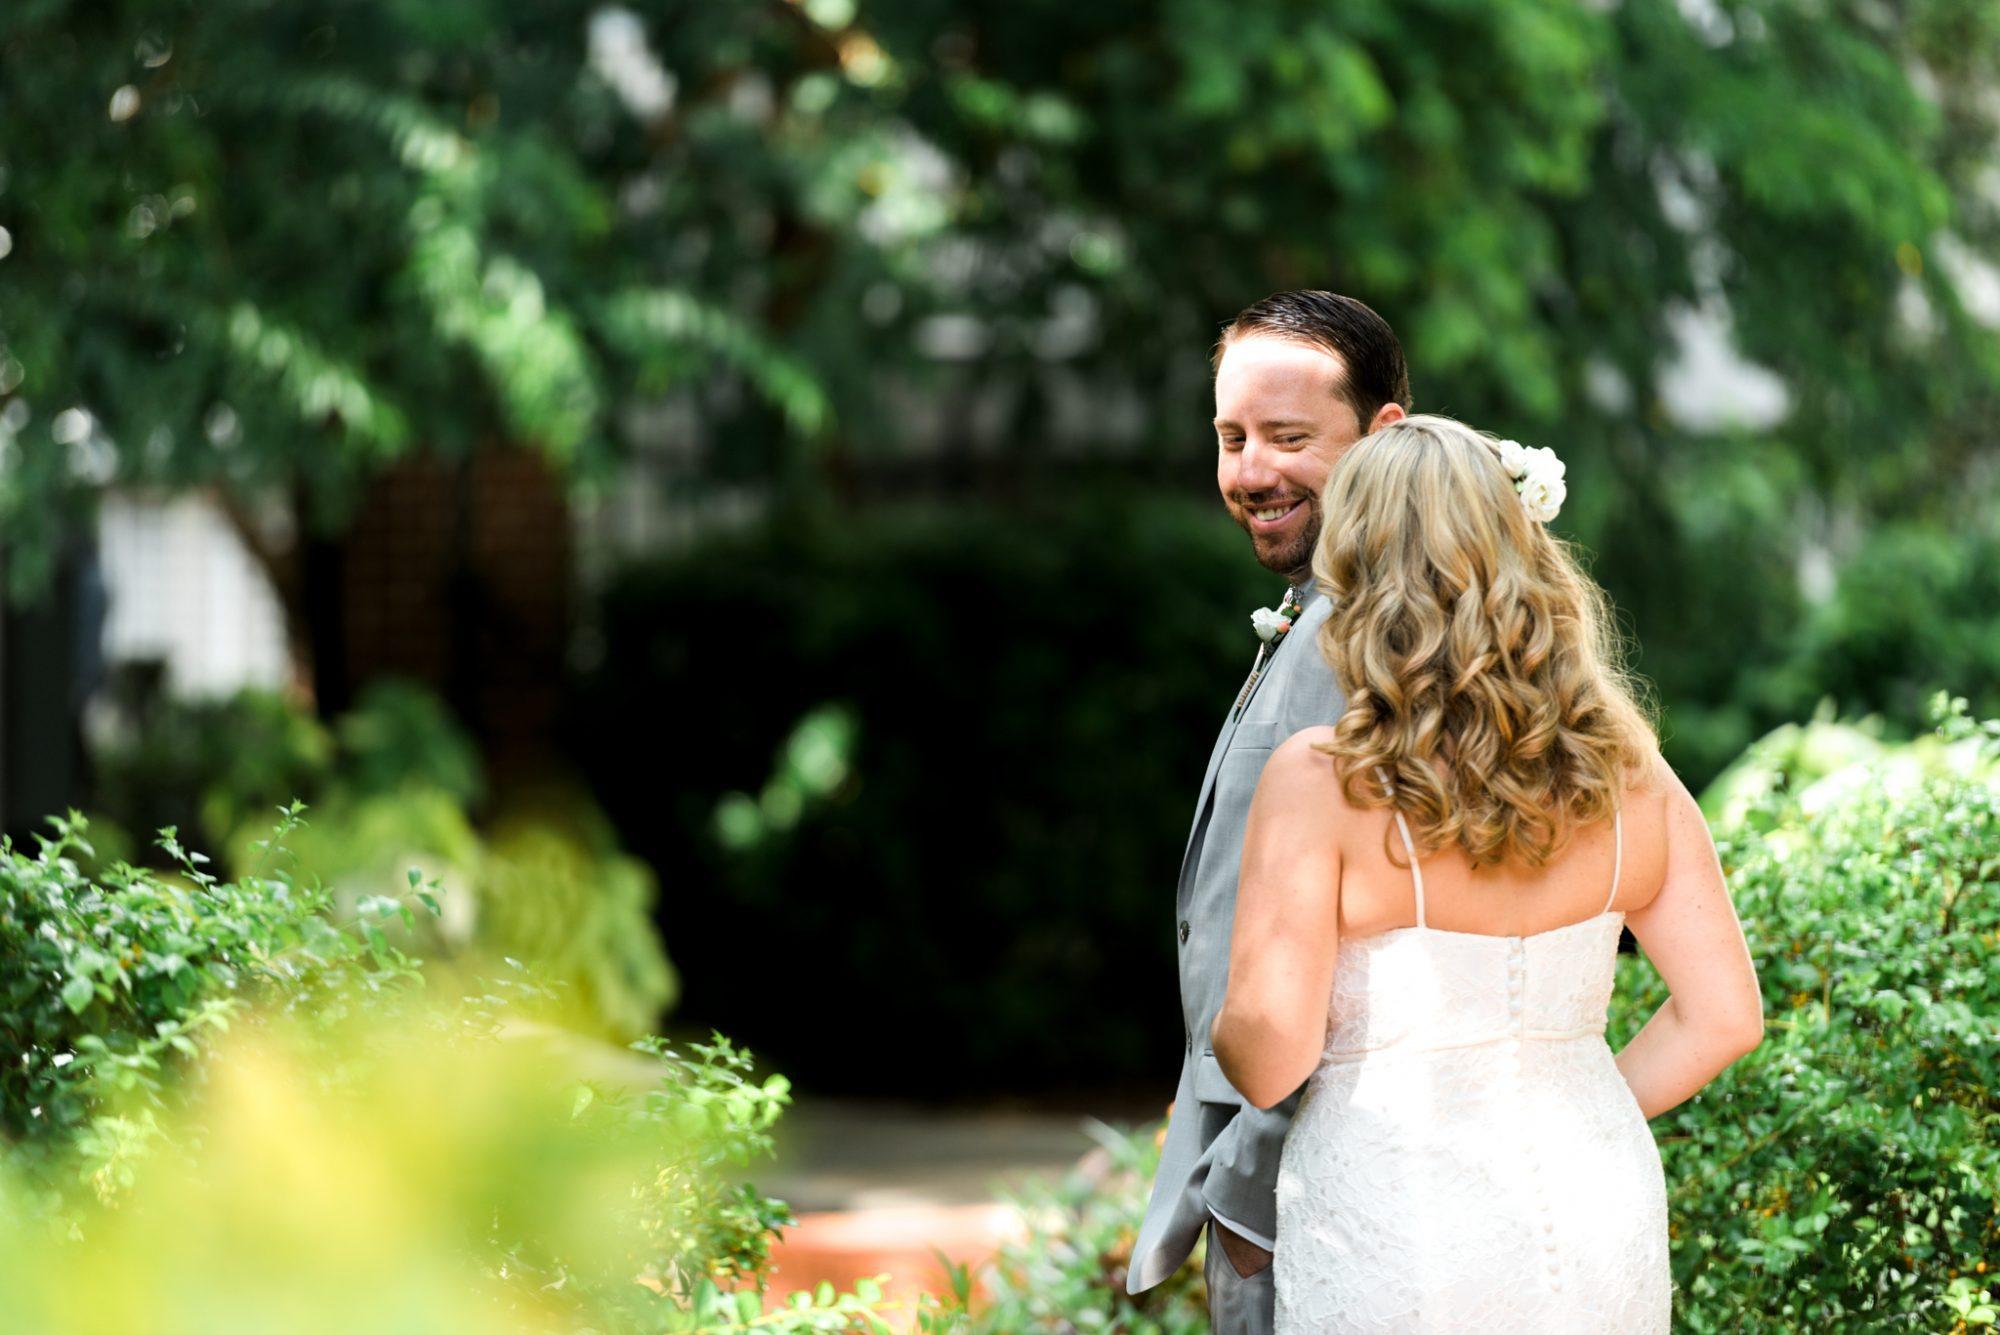 colleen-jonathan-audubon-house-wedding-key-west-20